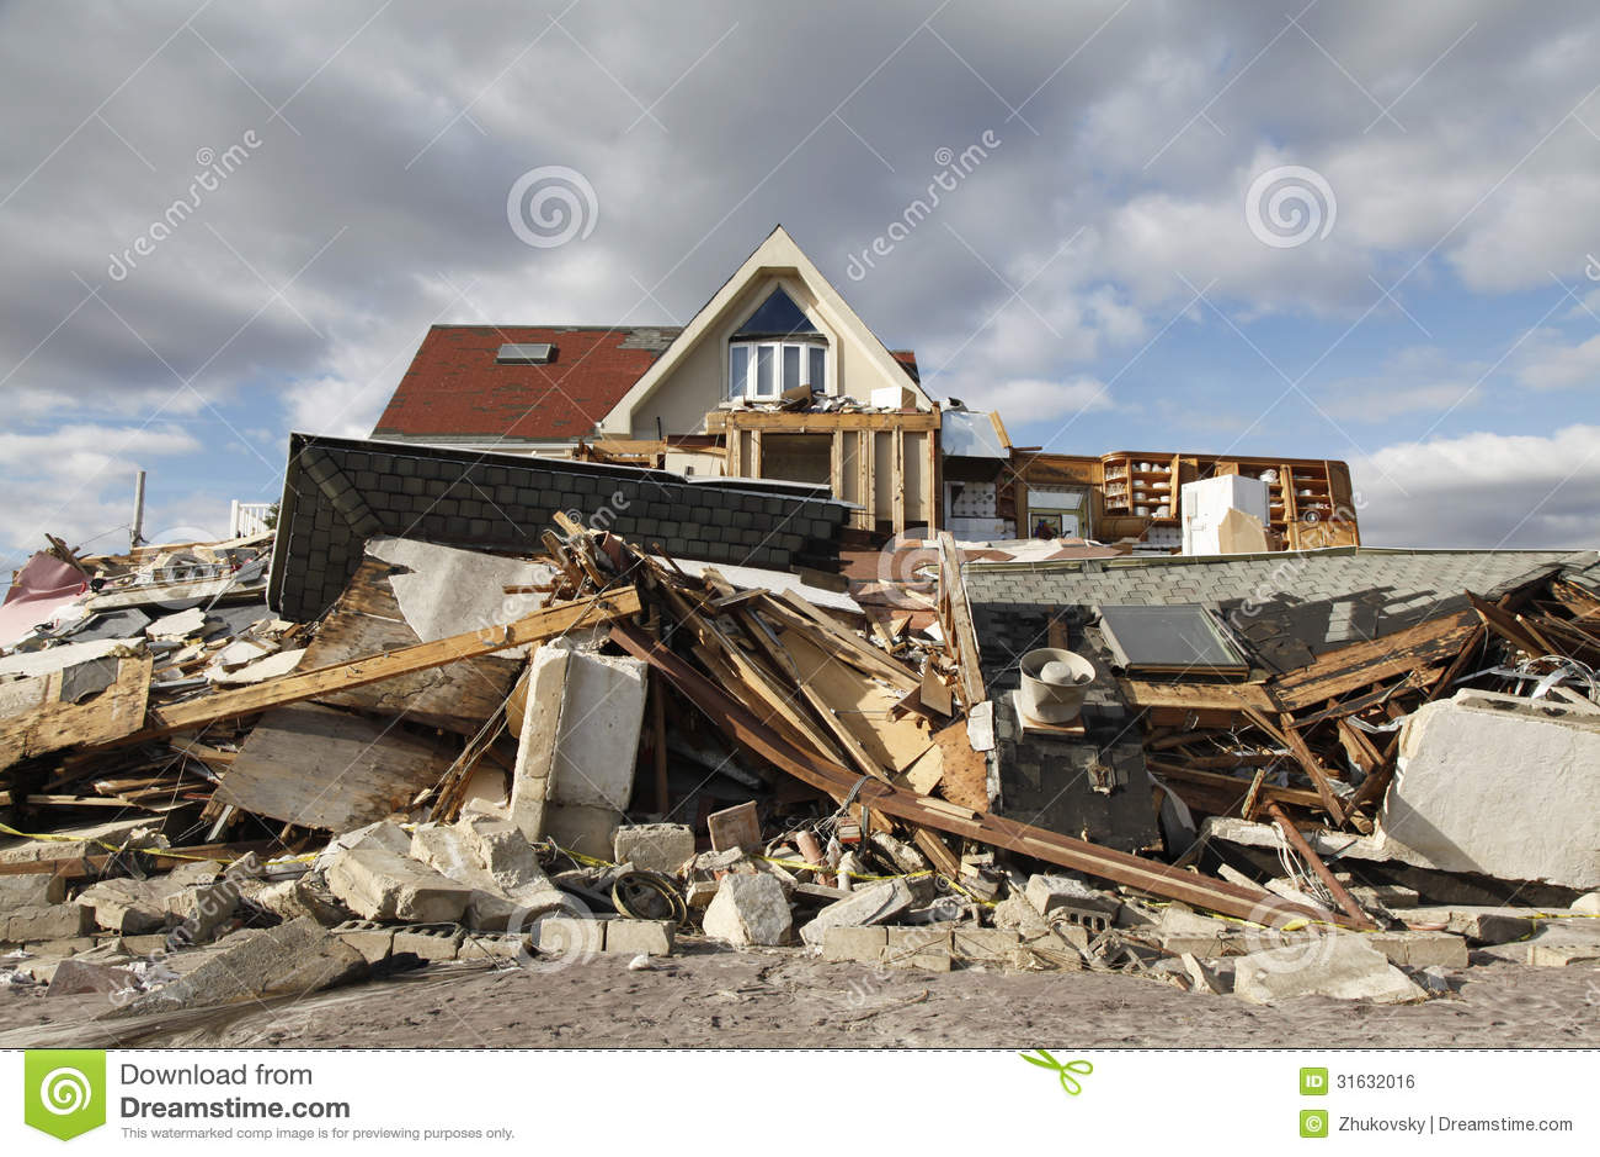 Hurricane Sandy | TMZ.com